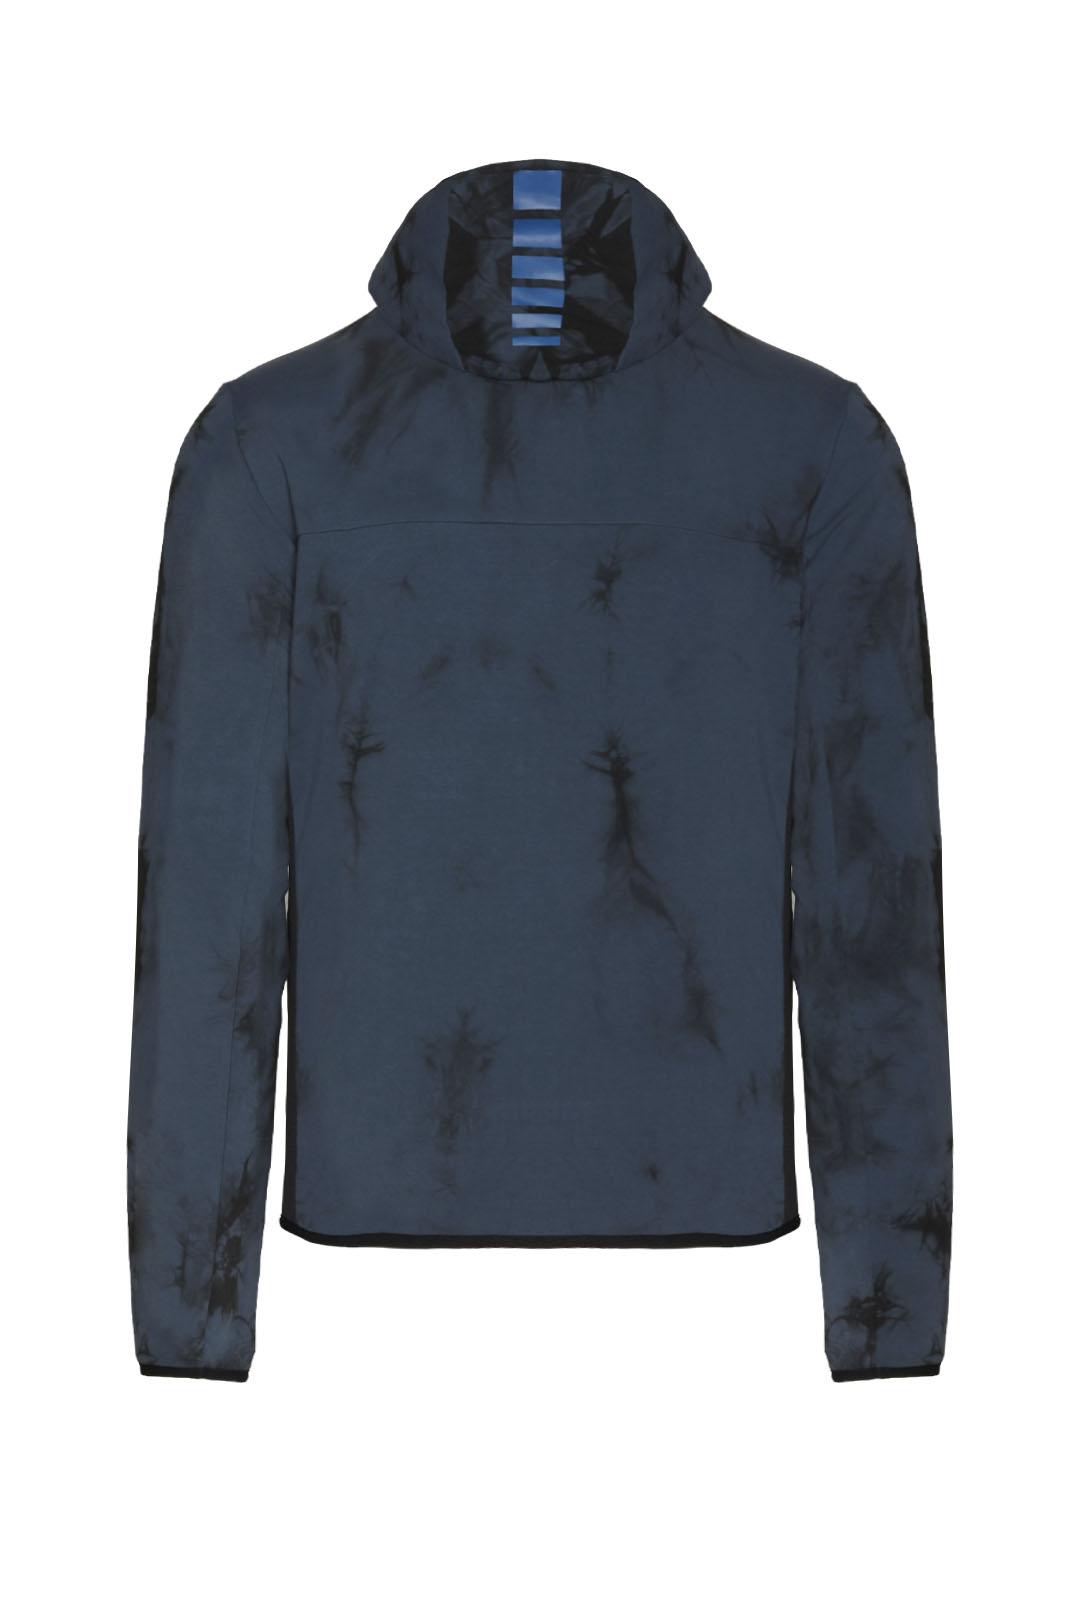 Stretch sweatshirt with a tie-dye effect 2